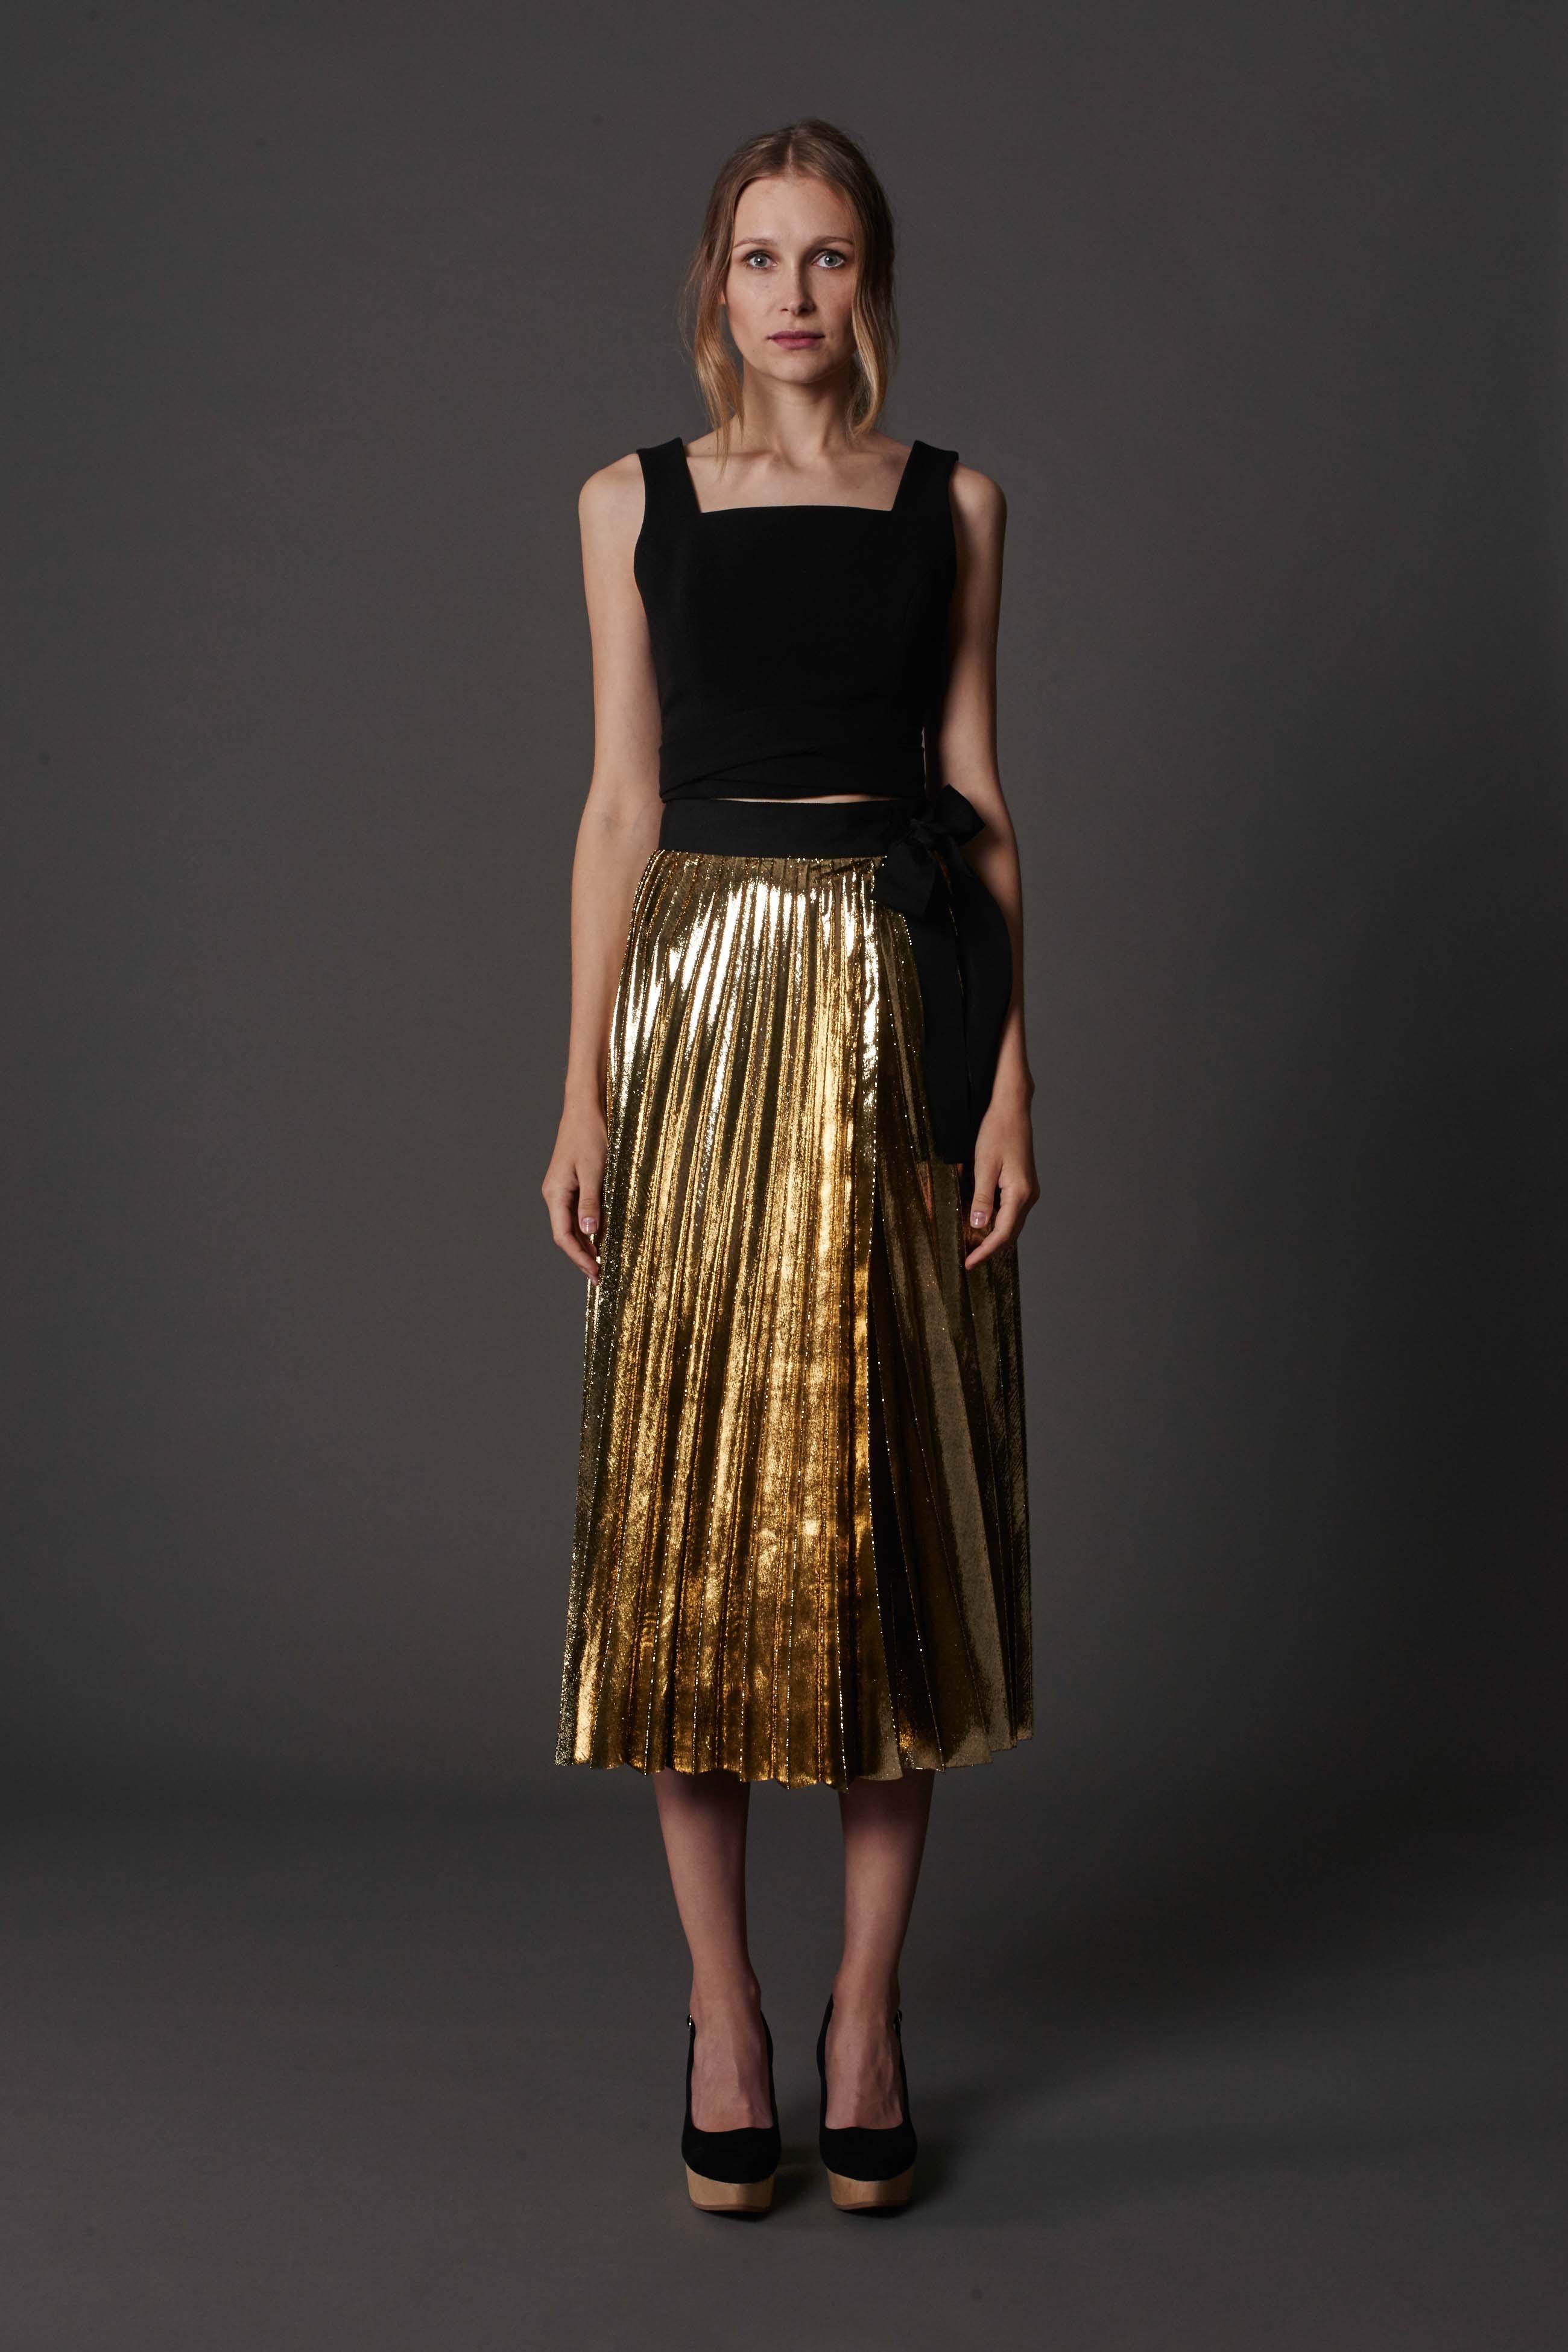 RUBY Nazad Crop Top, Zlata Pleat Skirt & Halo Heel